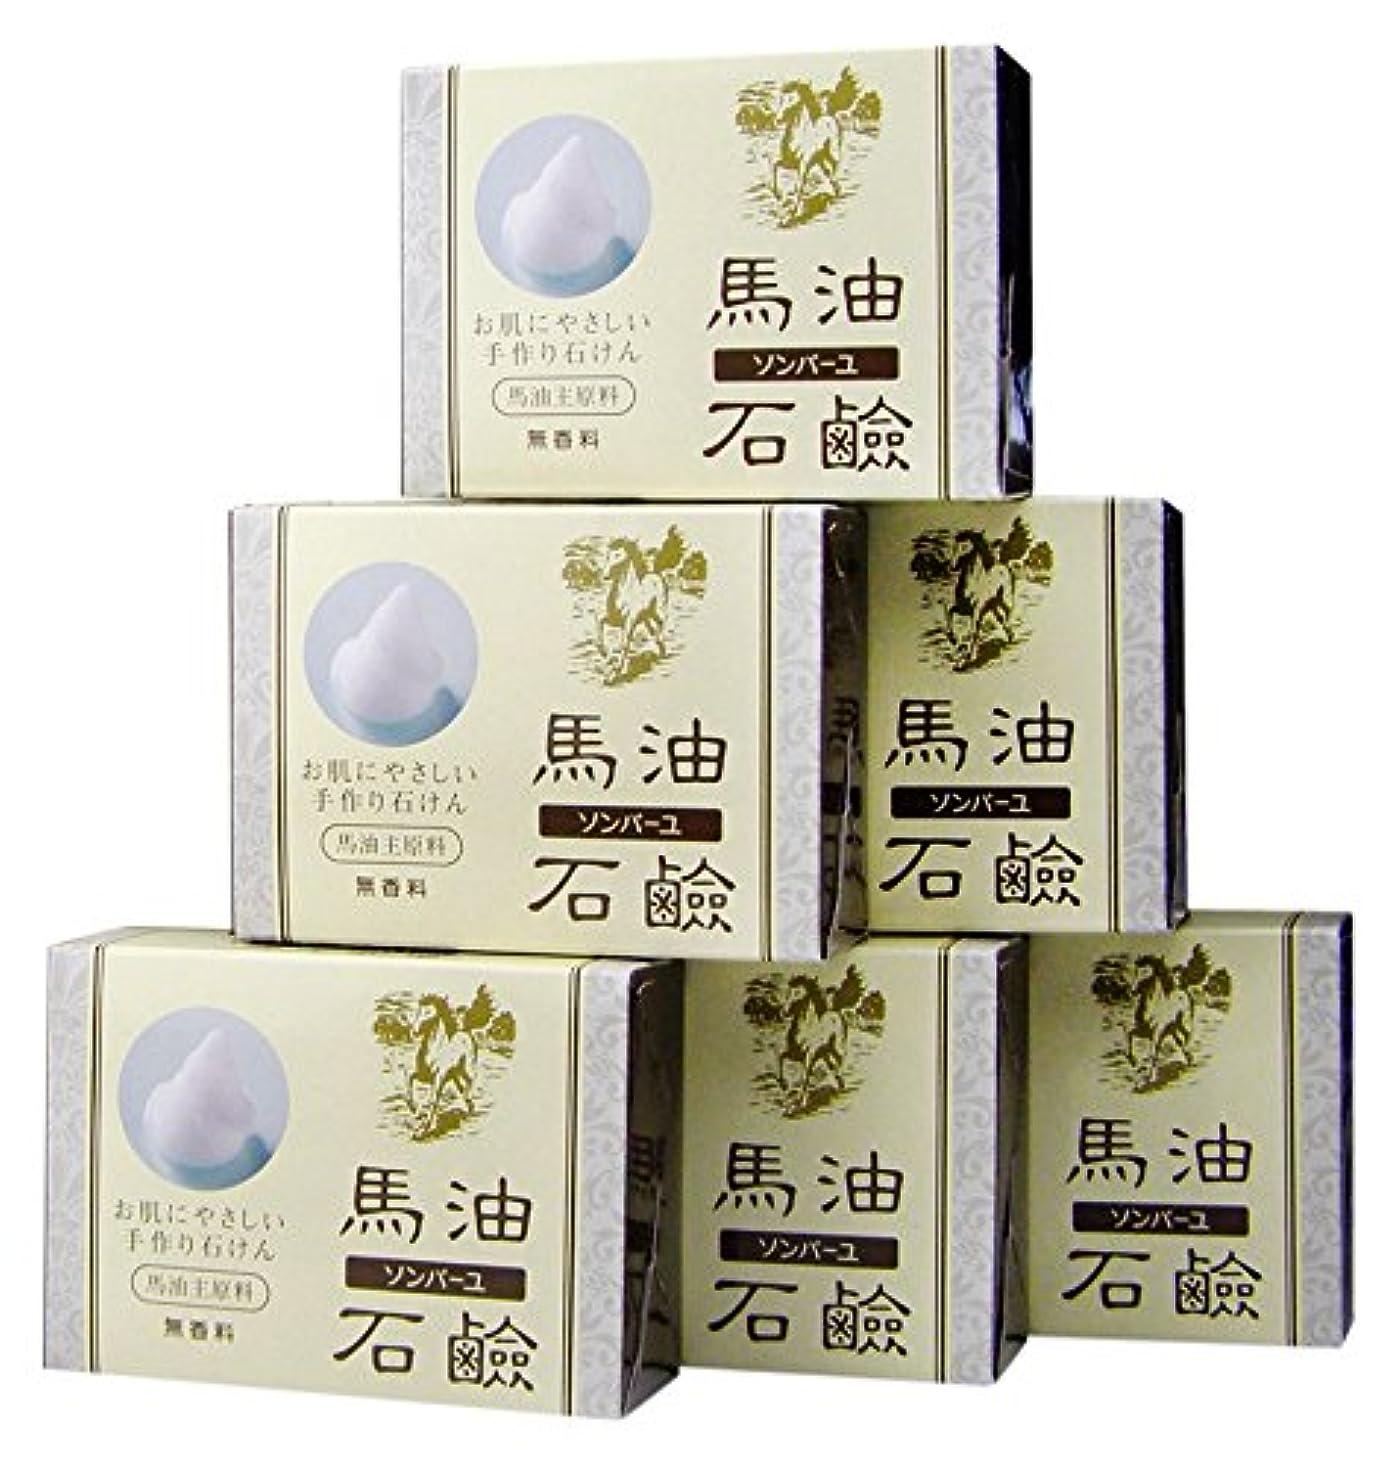 野生難破船早熟ソンバーユ馬油石鹸(無香料)6個入(85g×6)